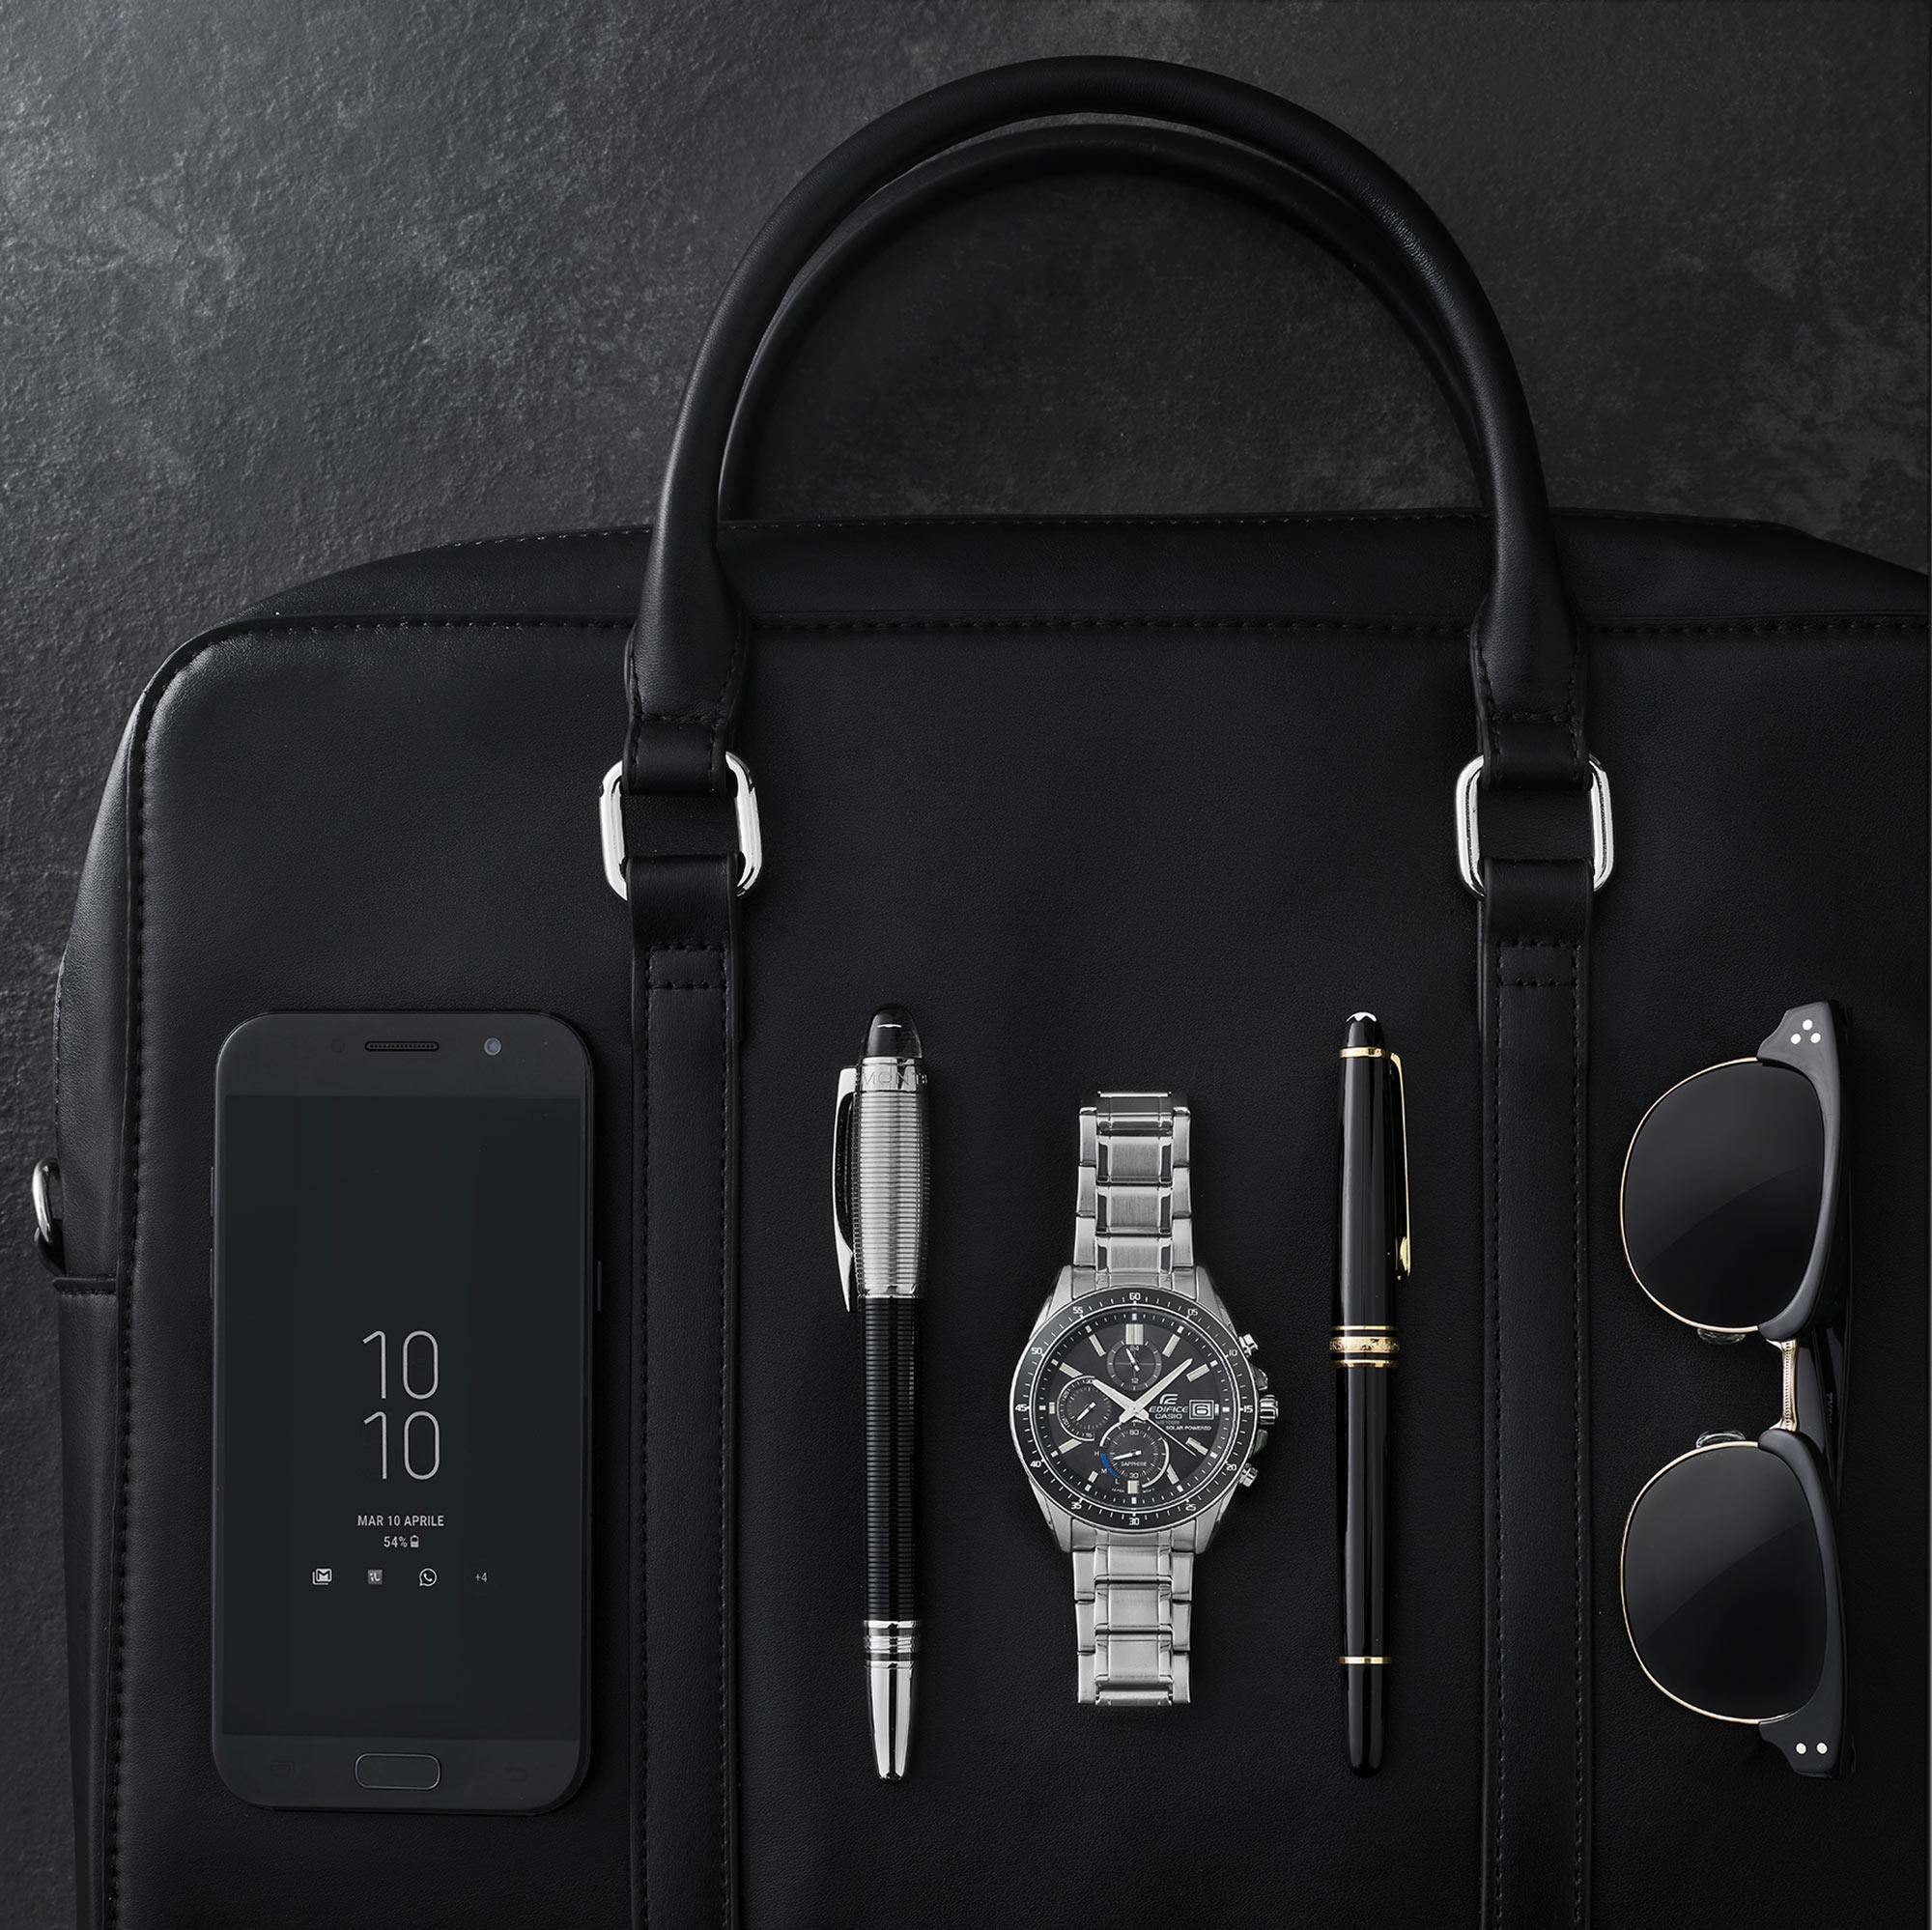 Man Smartphone Mobile Phone Pen Bag Glasses Still Life Shot for Casio by Fotografando